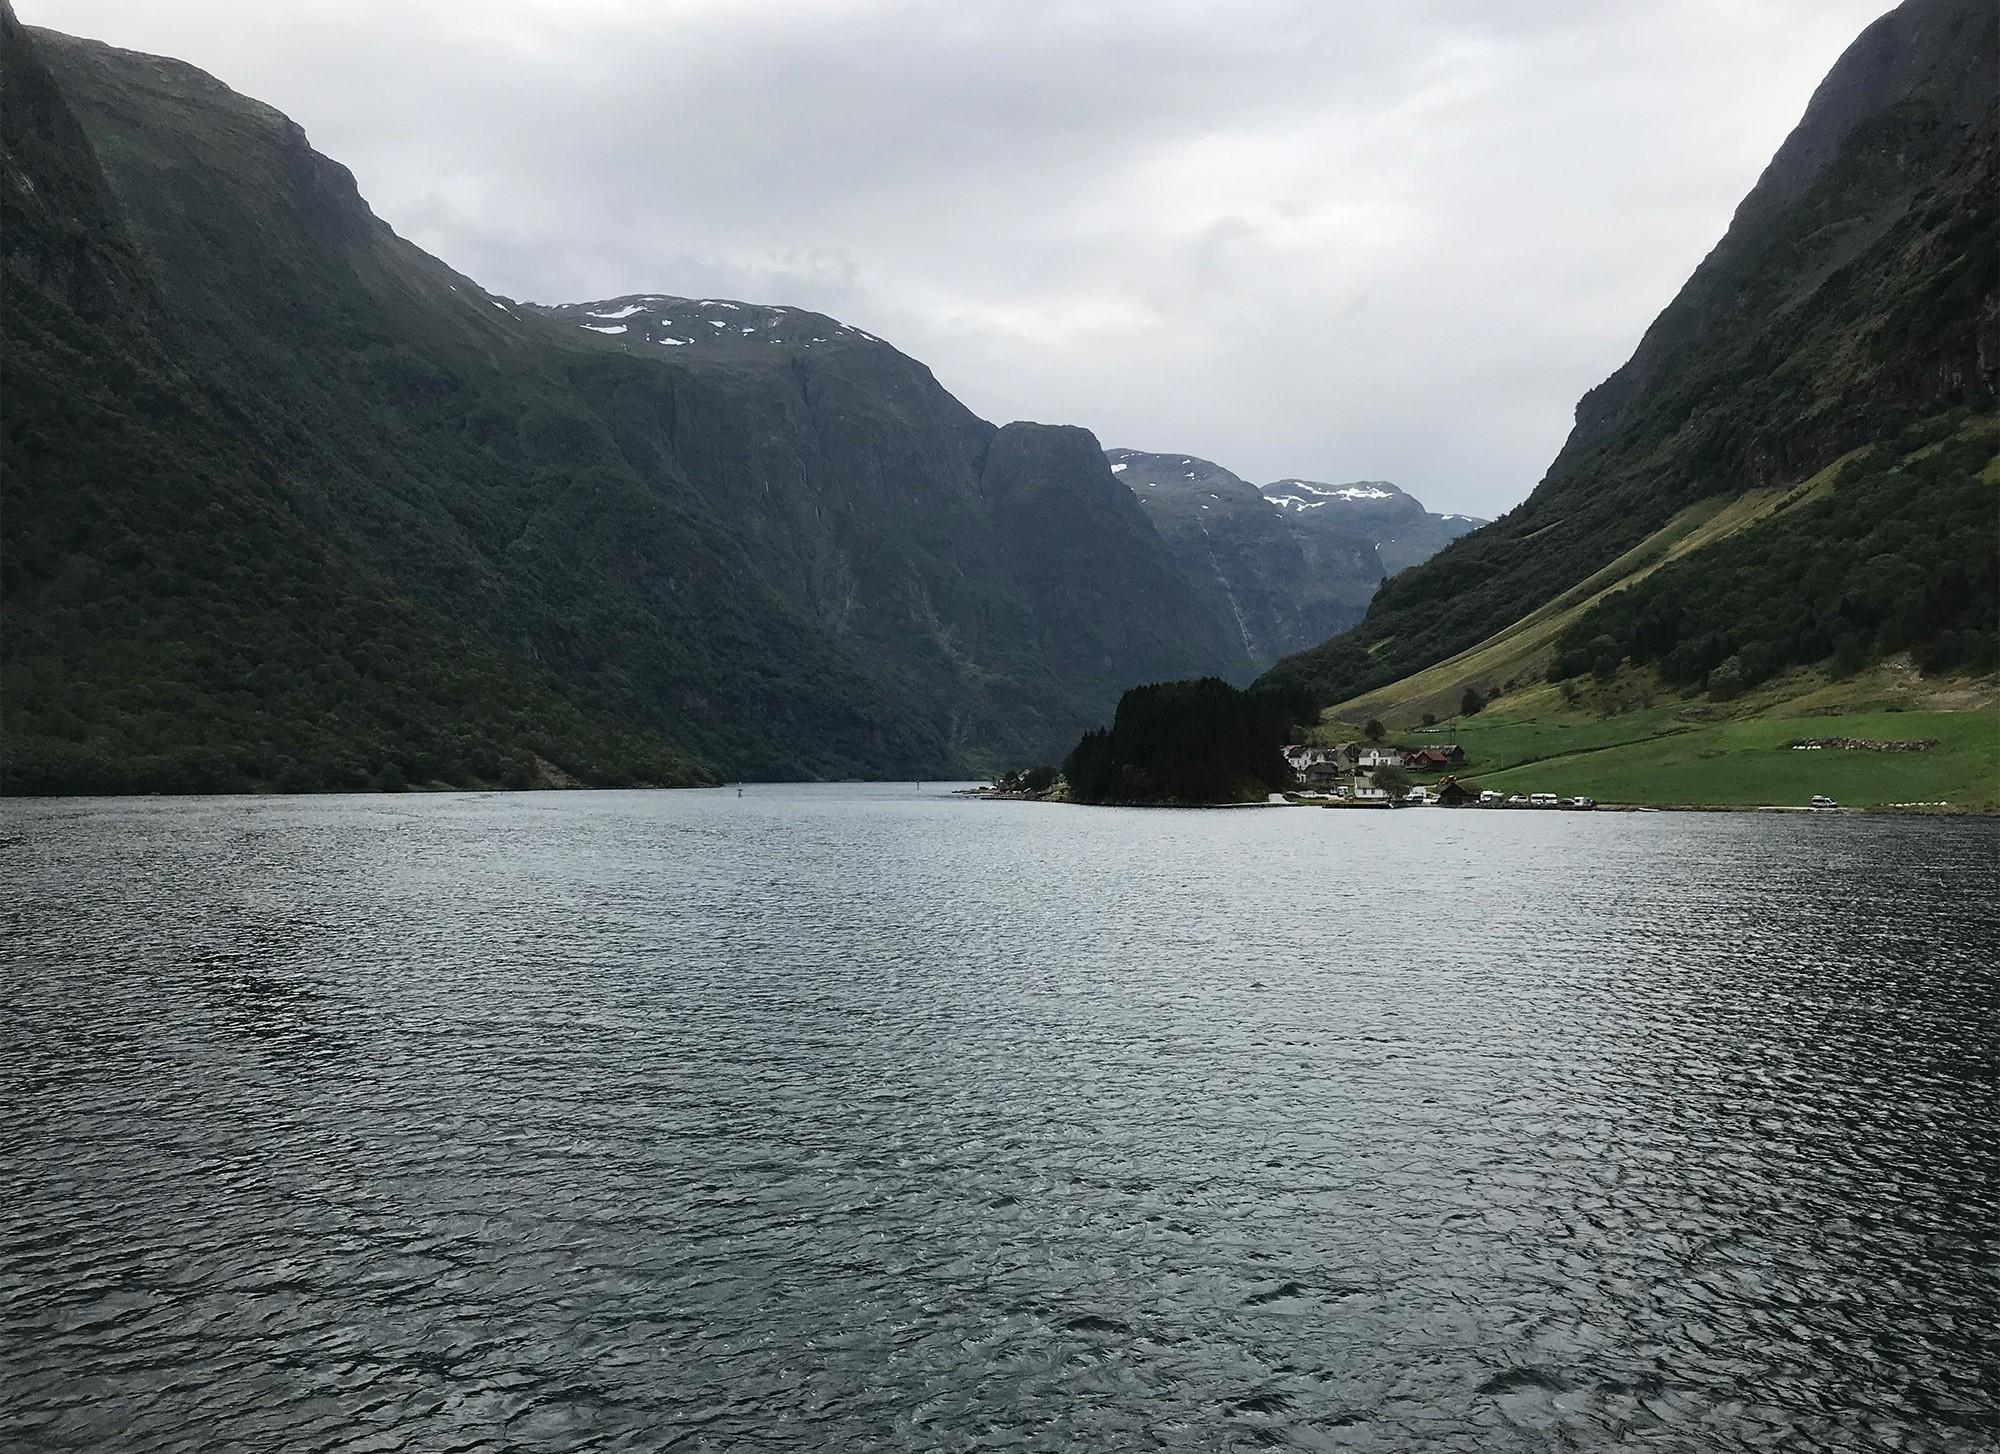 Aurlandsfjord Norway Summer 2018